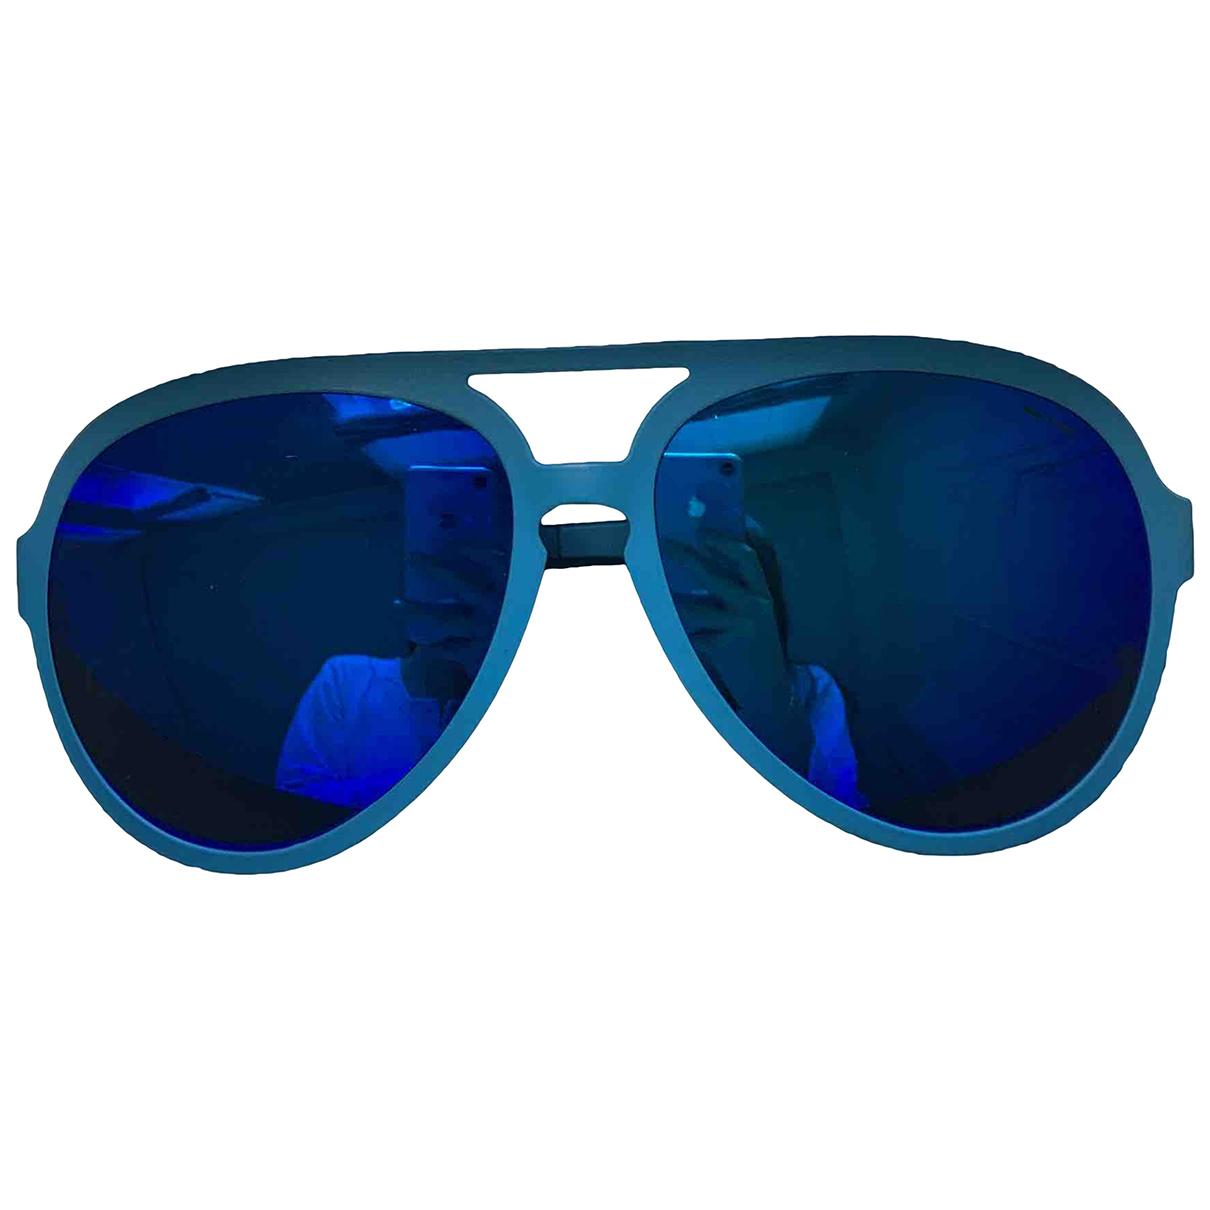 Italia Independent - Lunettes   pour homme - bleu